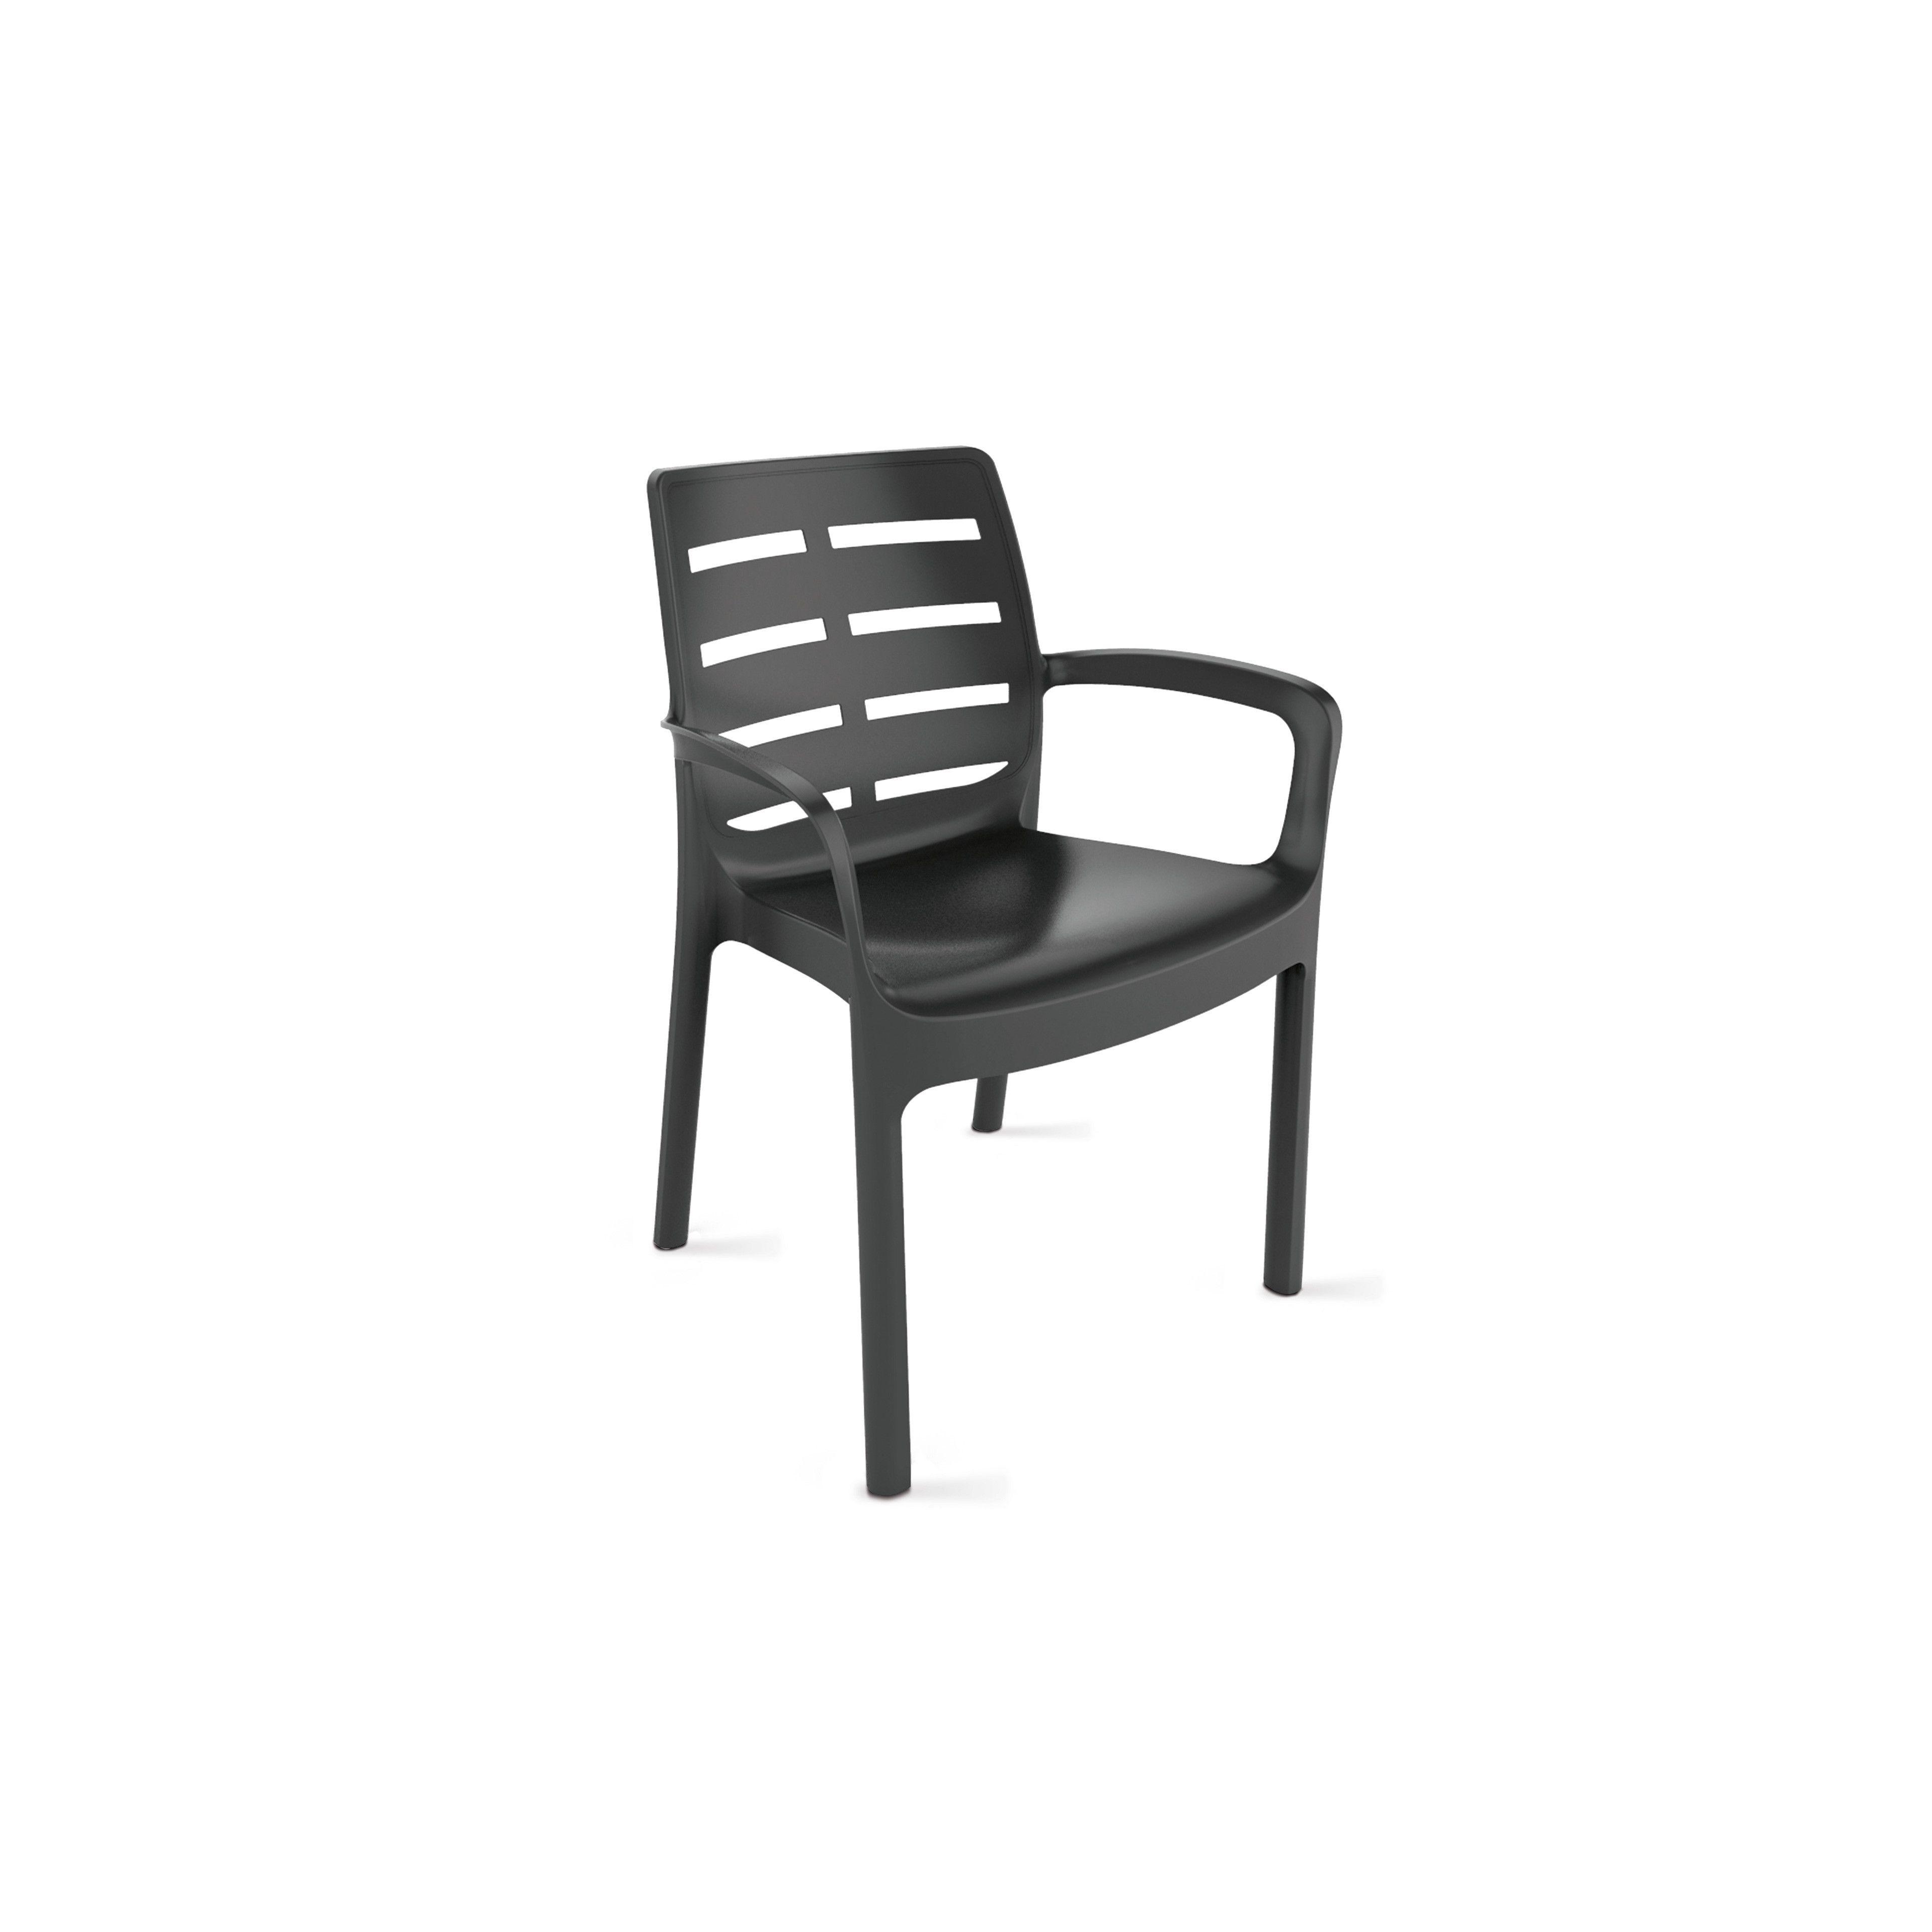 fauteuil de jardin plastique gris. Black Bedroom Furniture Sets. Home Design Ideas